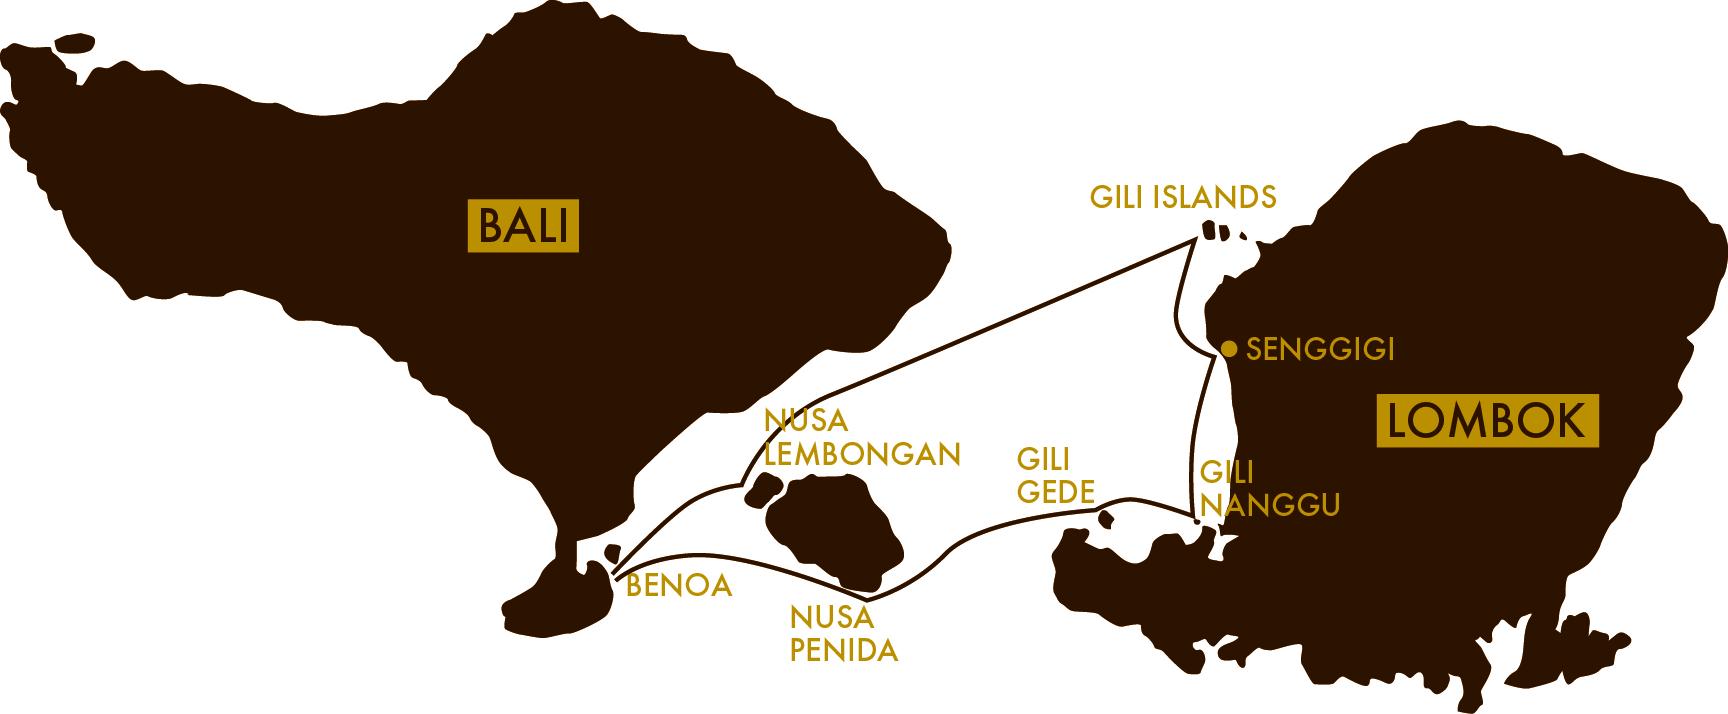 Bali - Lombok Dream